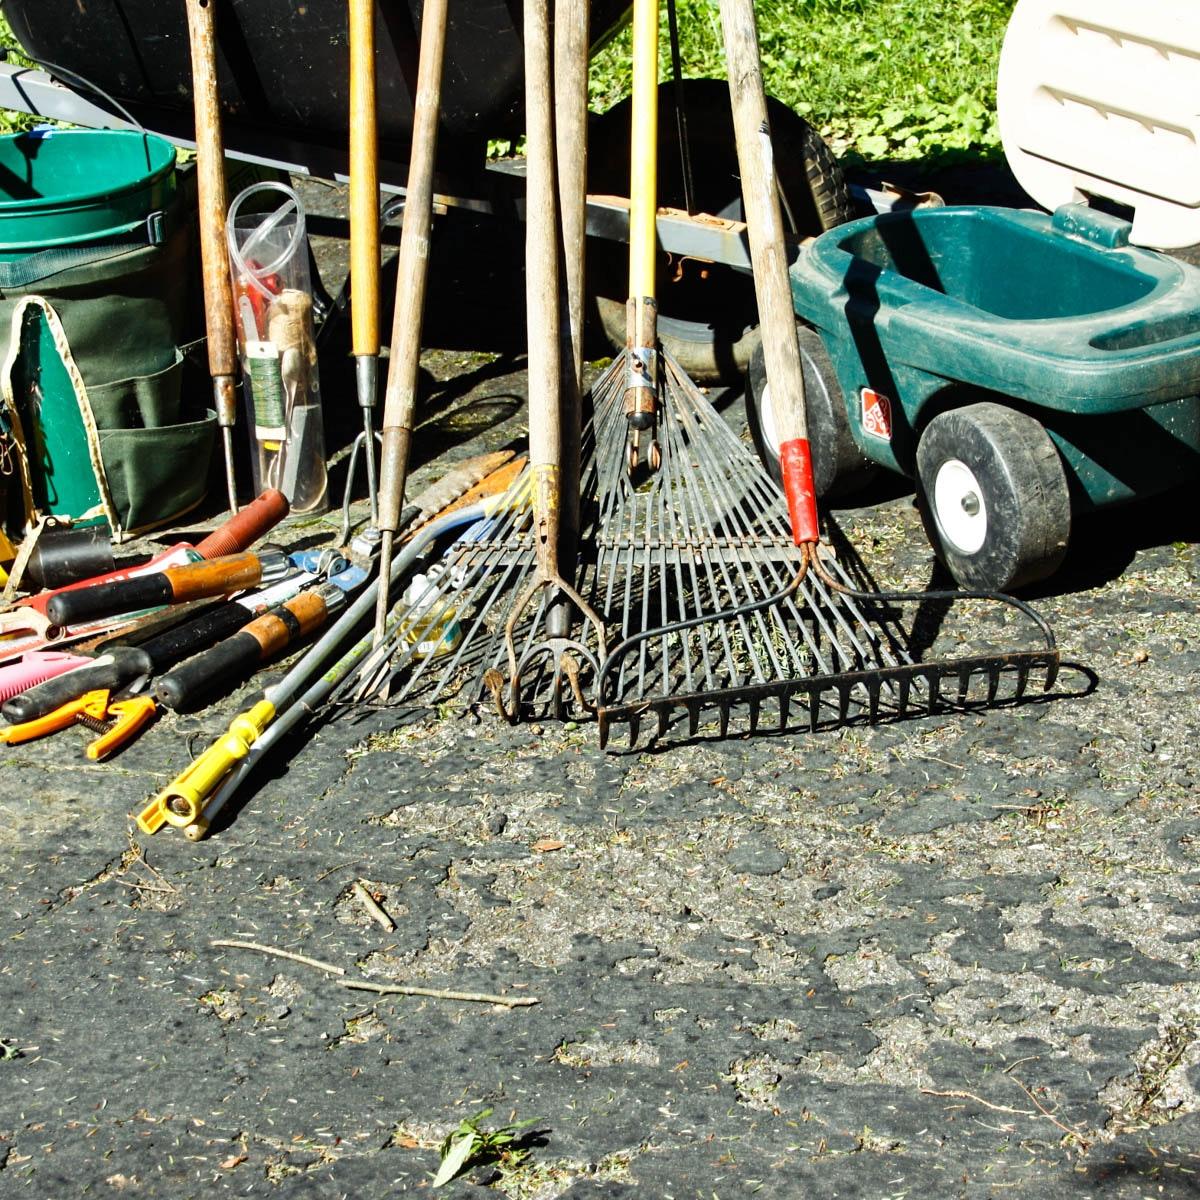 Wheelbarrow with gardening tools ebth for Best gardening tools 2016